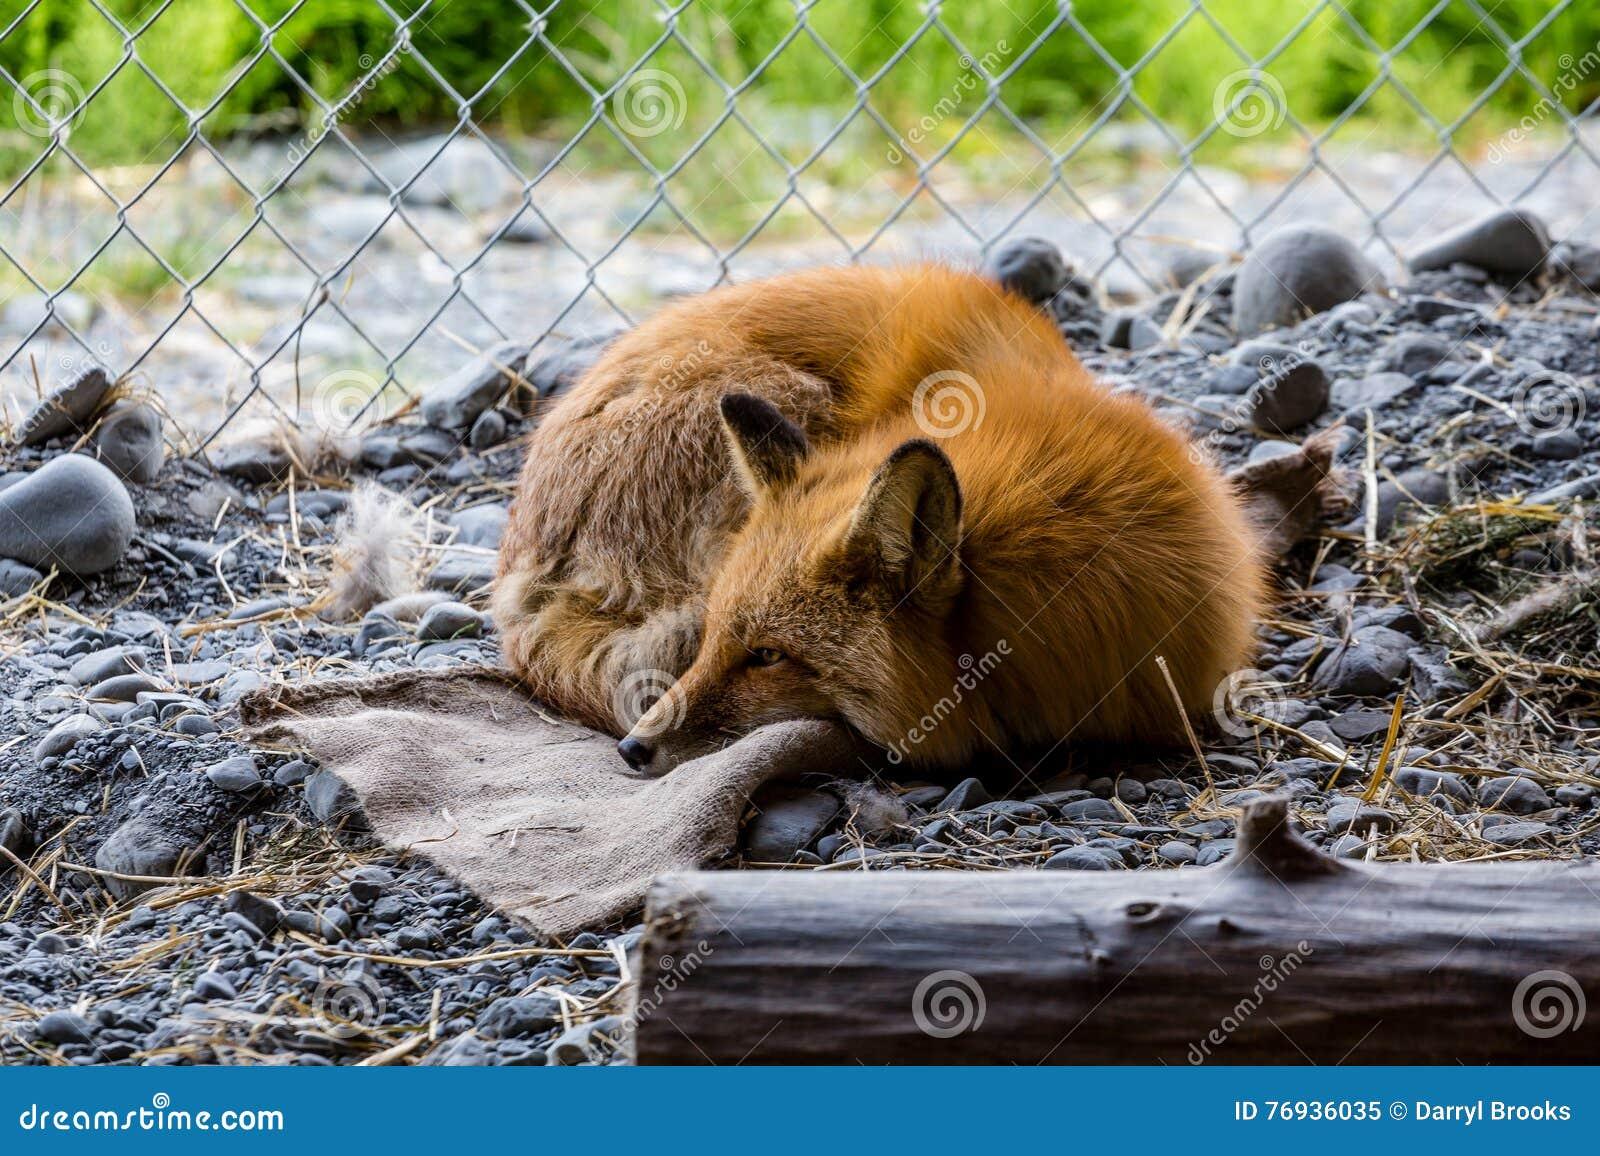 fox waking up stock image image of cute sleep young 76936035